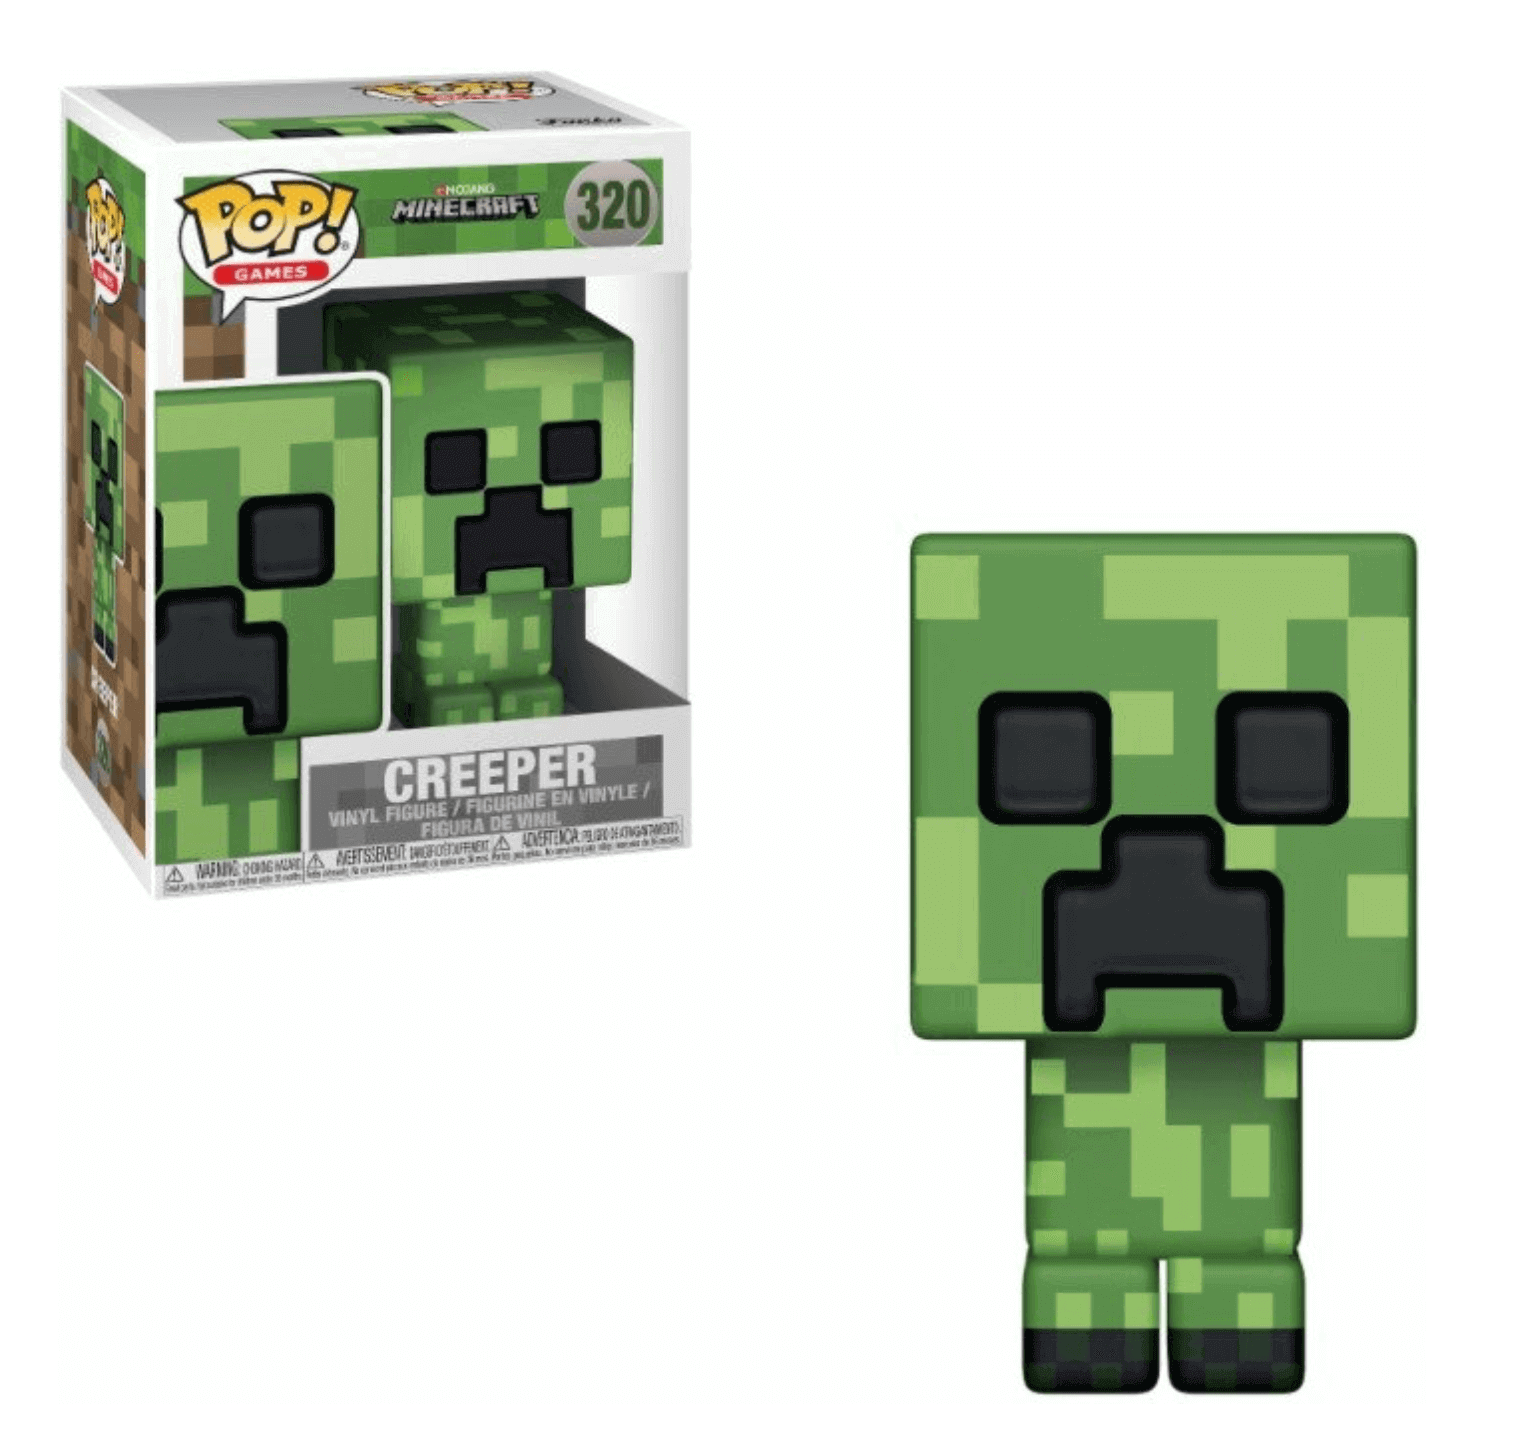 Pop! Games: Minecraft - Creeper